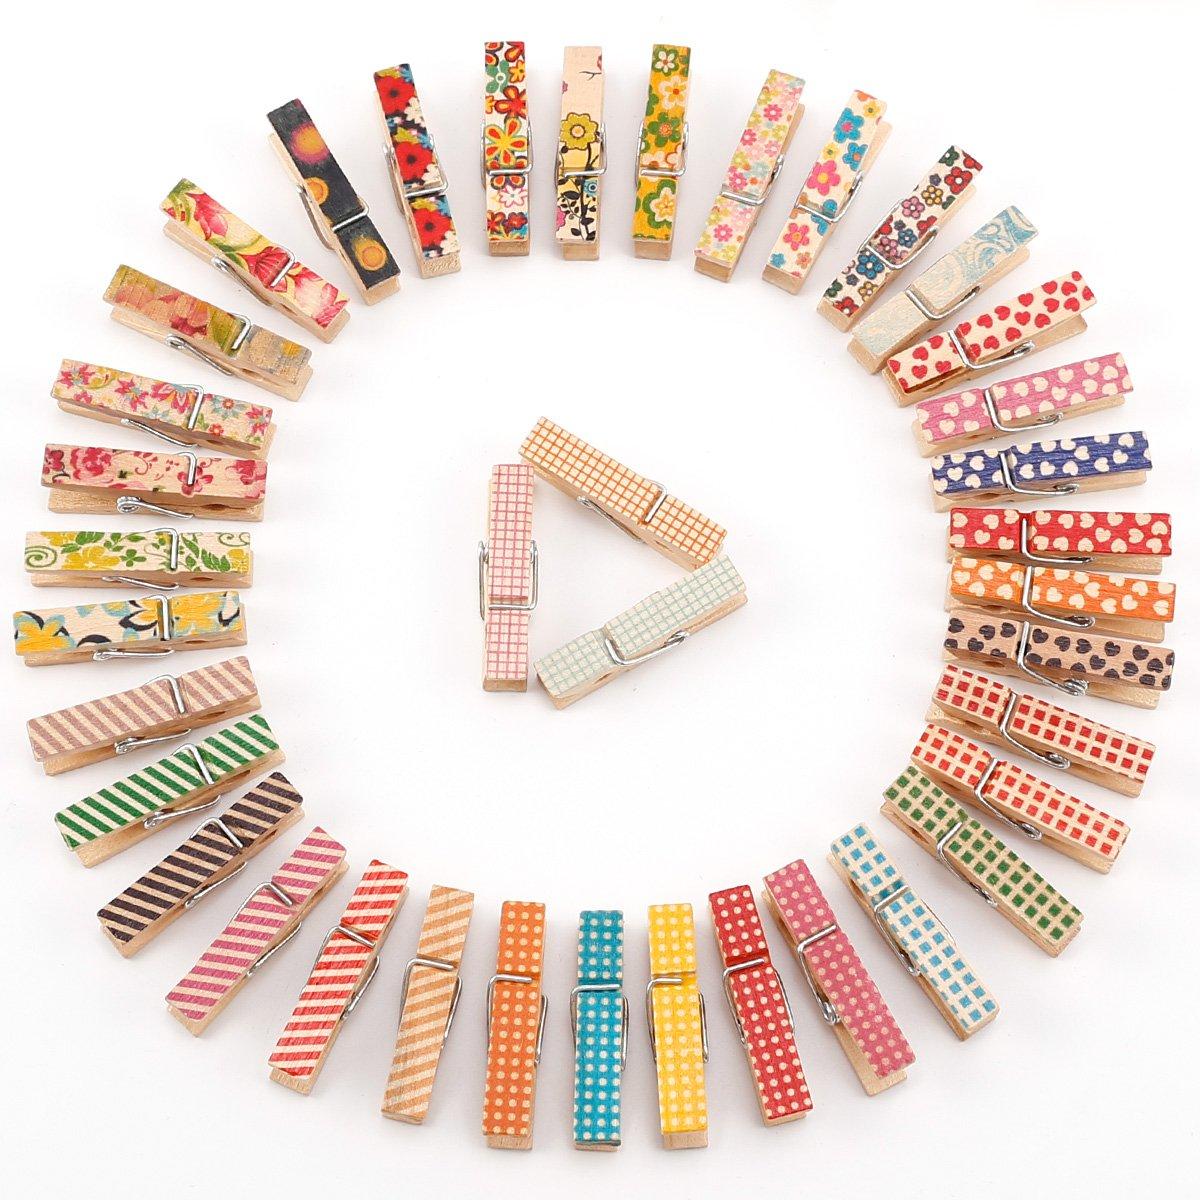 CLE DE TOUS - 50-100pcs Mini pinzas de madera pintados Clips para decorar Boda Fiesta Foto Papel Nota Tarjeta postal (100) Anladia